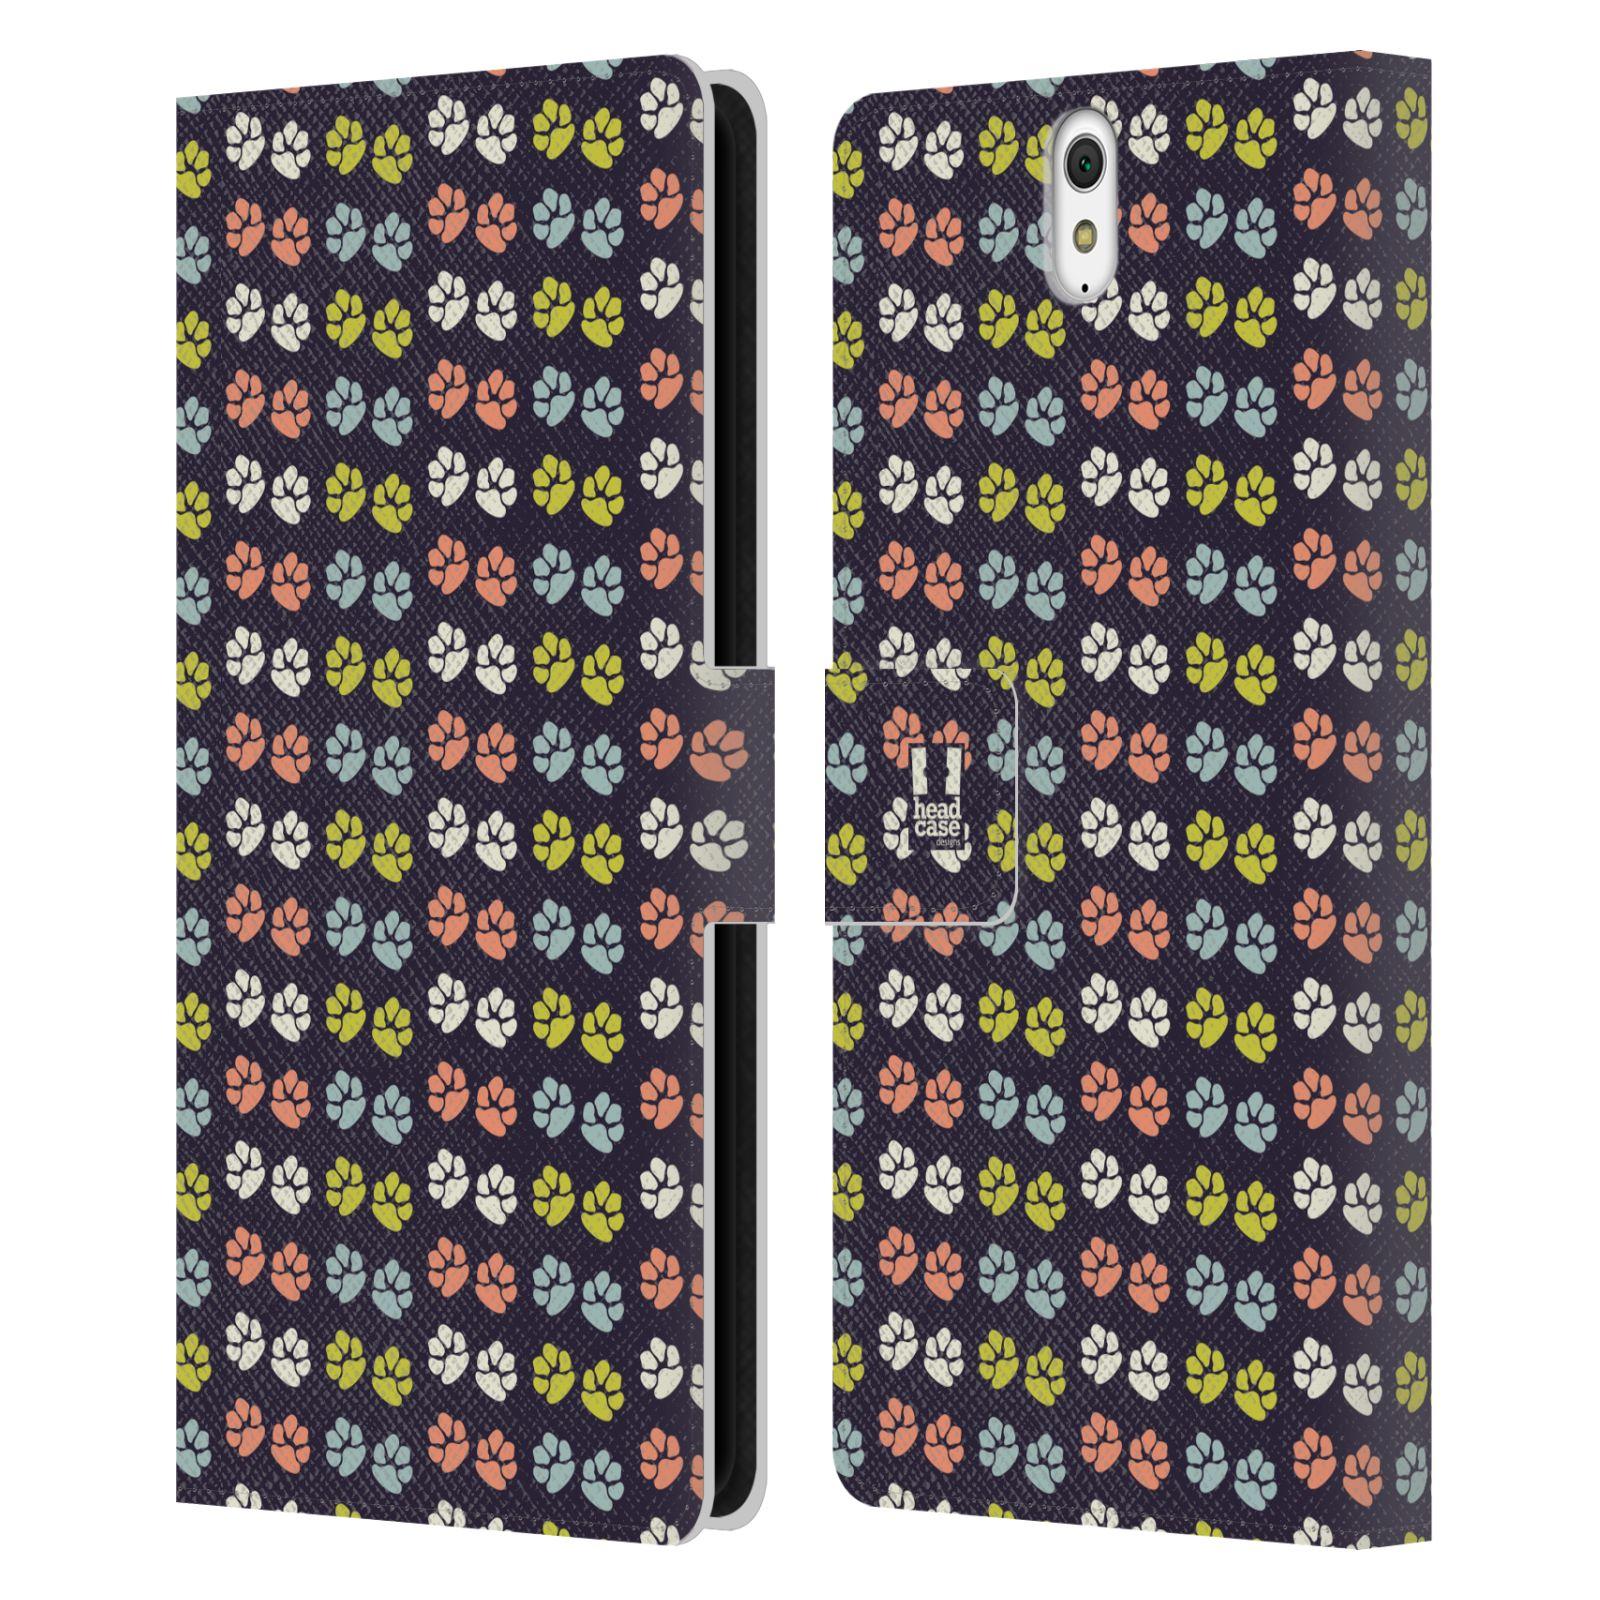 HEAD CASE Flipové pouzdro pro mobil SONY XPERIA C5 Ultra Pejsek ťapky barevné RETRO